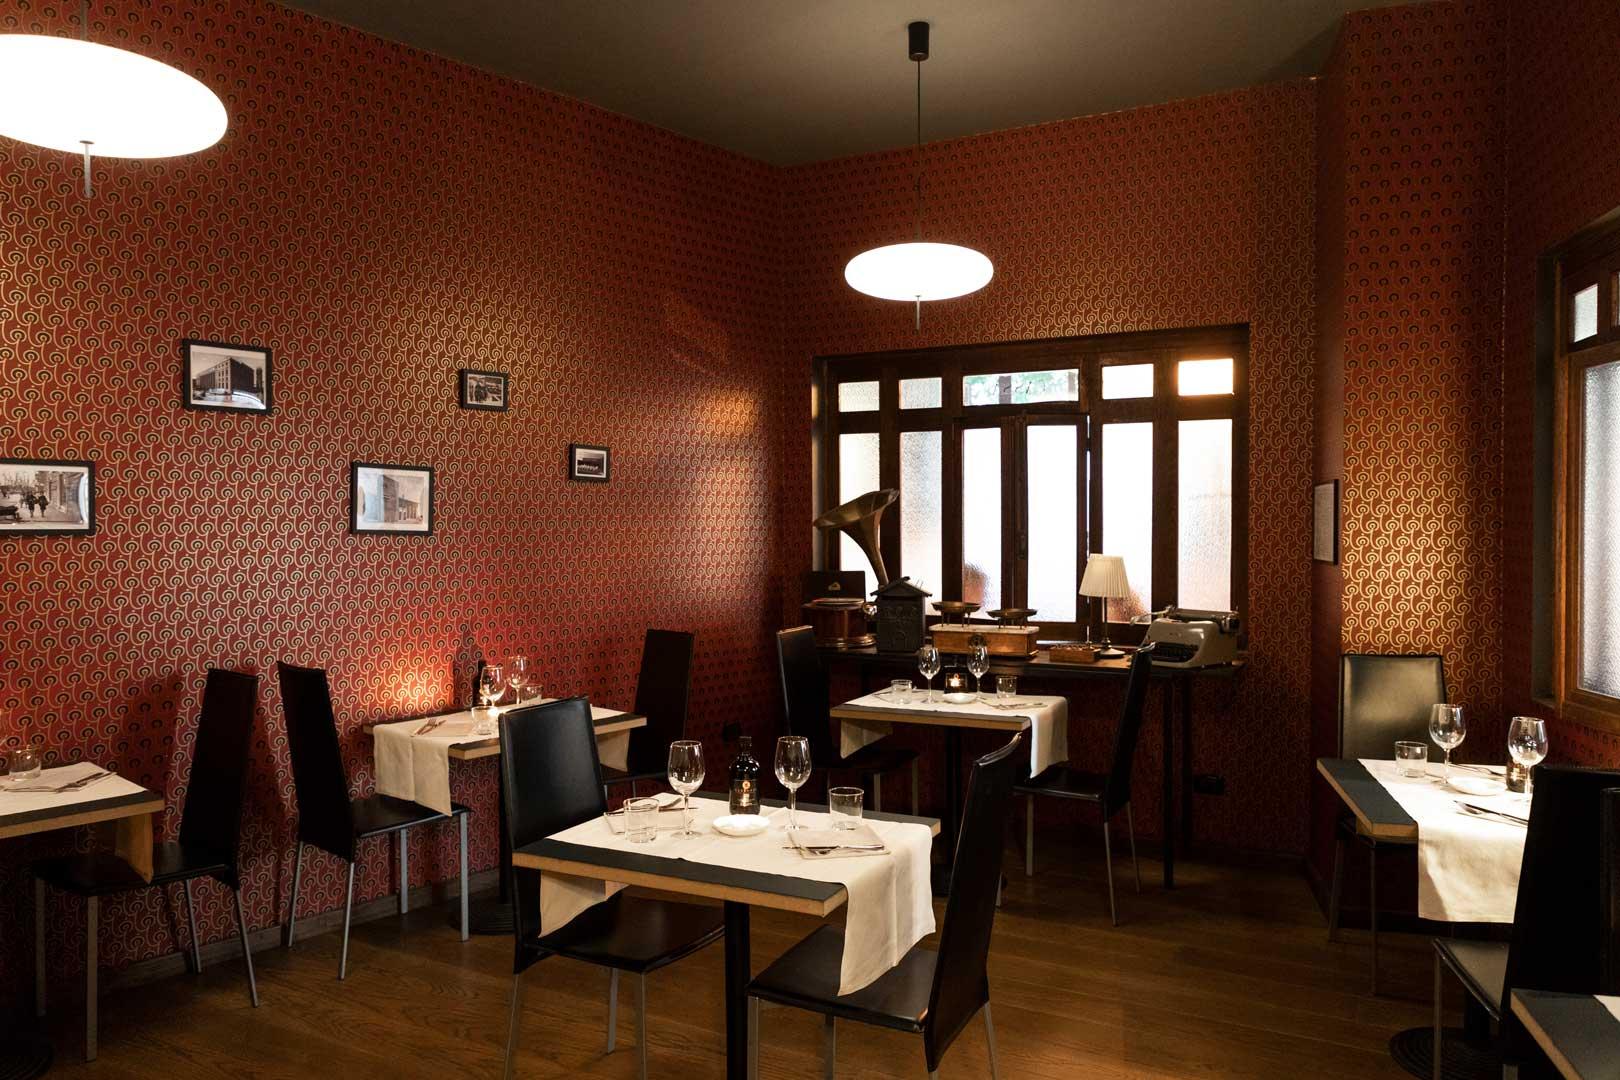 il-menu-invernale-di-posta-bistrot-sala